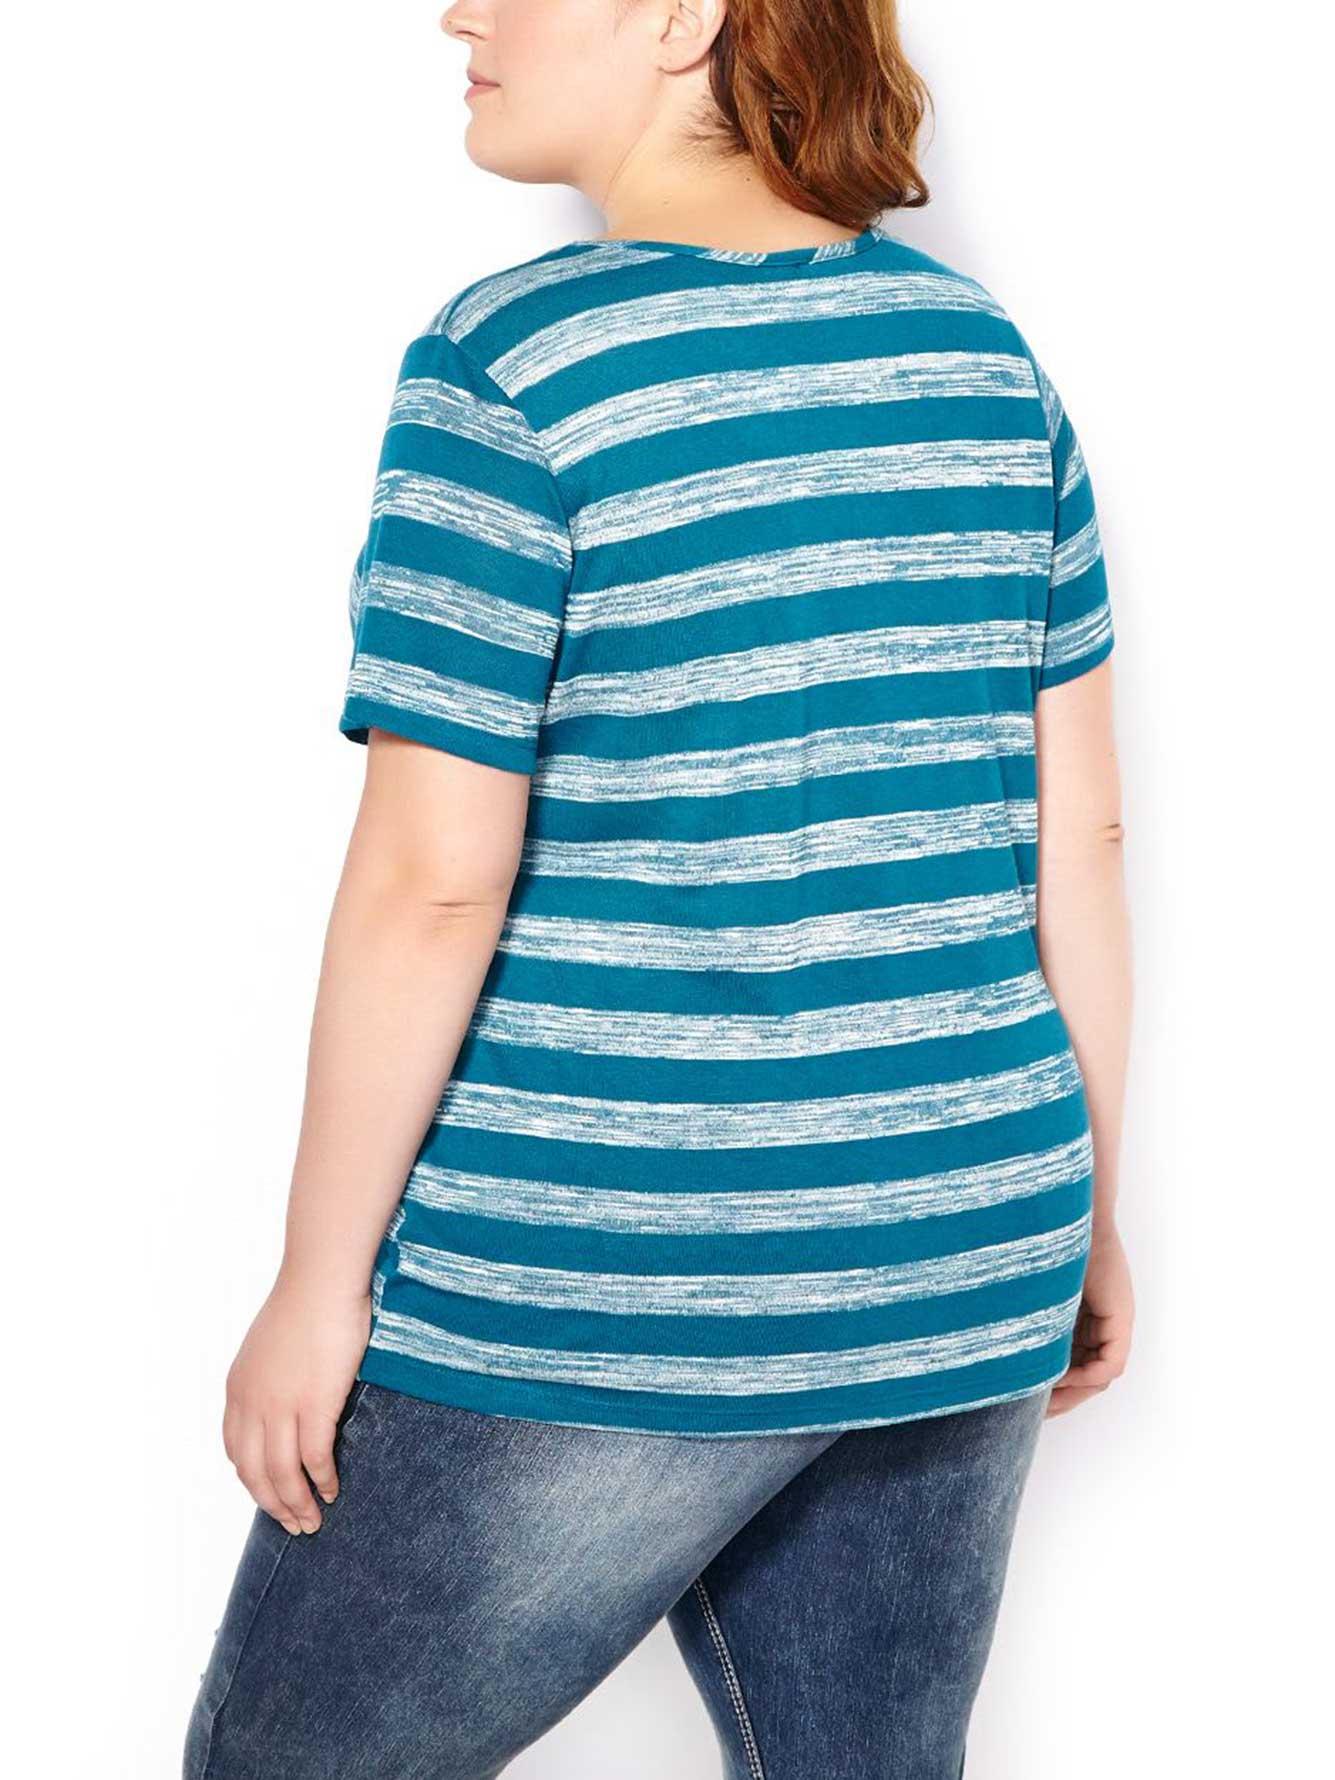 Form Fit Striped T Shirt Penningtons